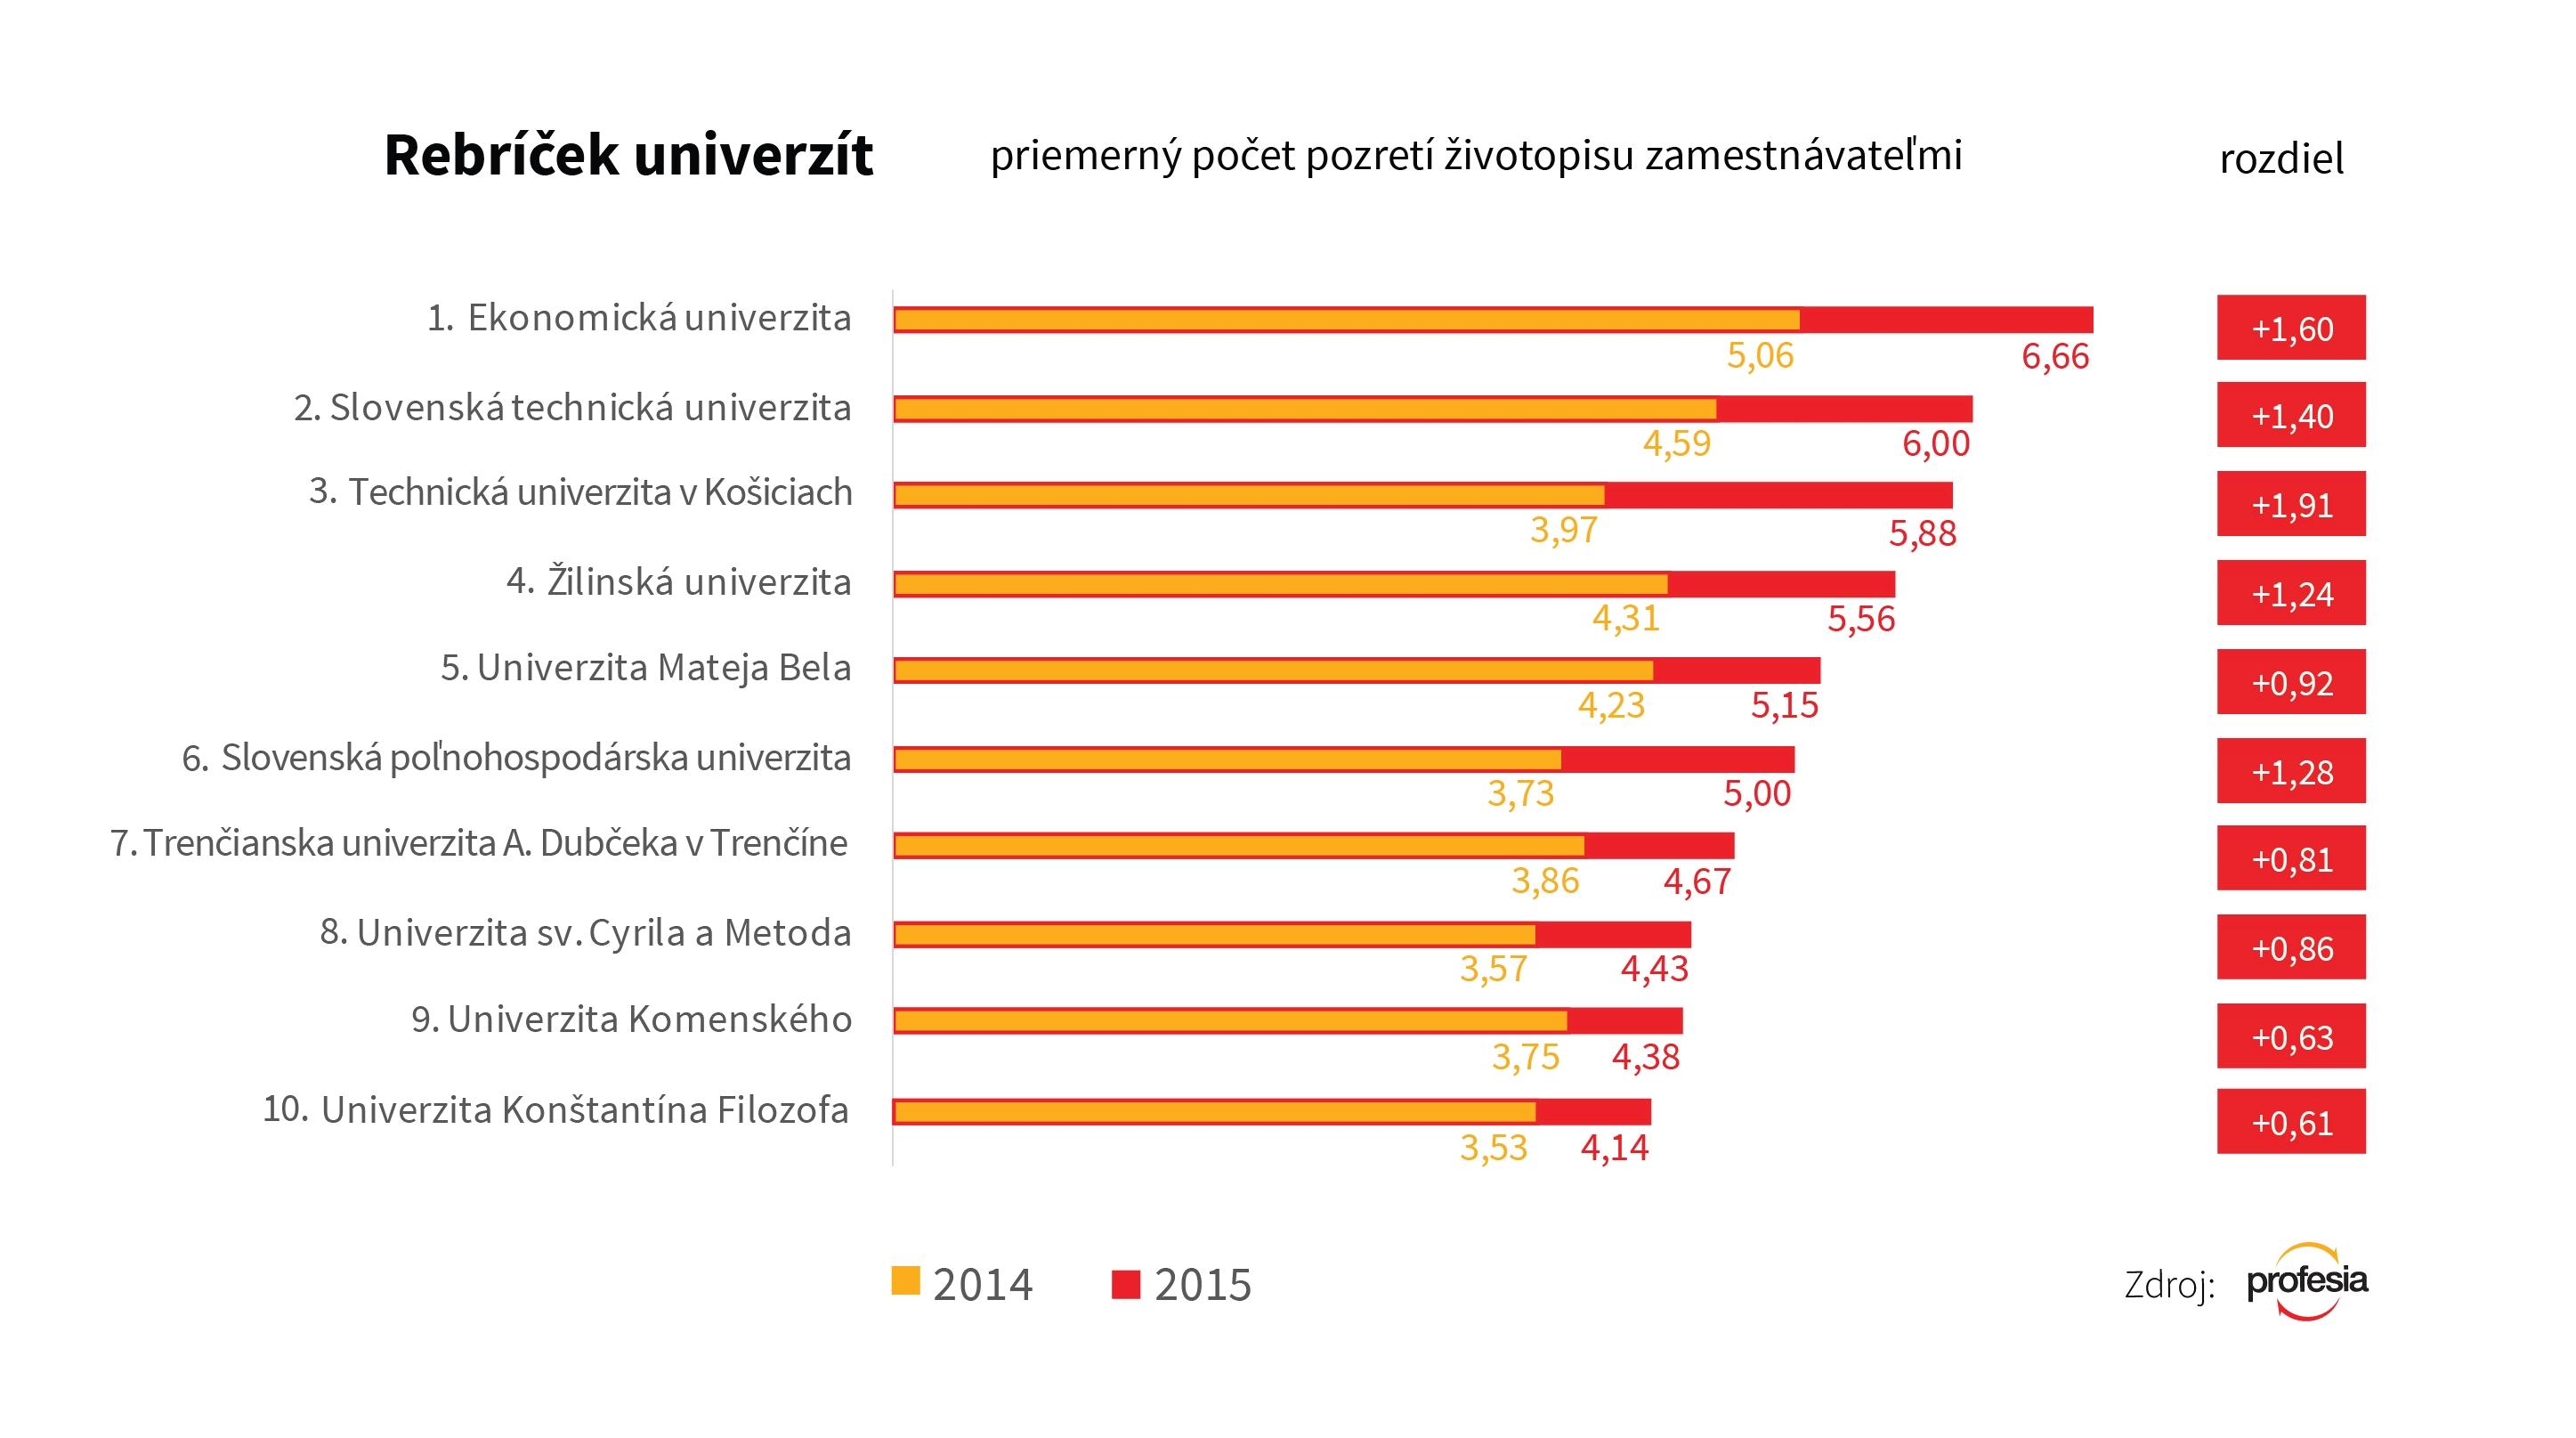 rebricek_univerzit_web2016_3_nowat